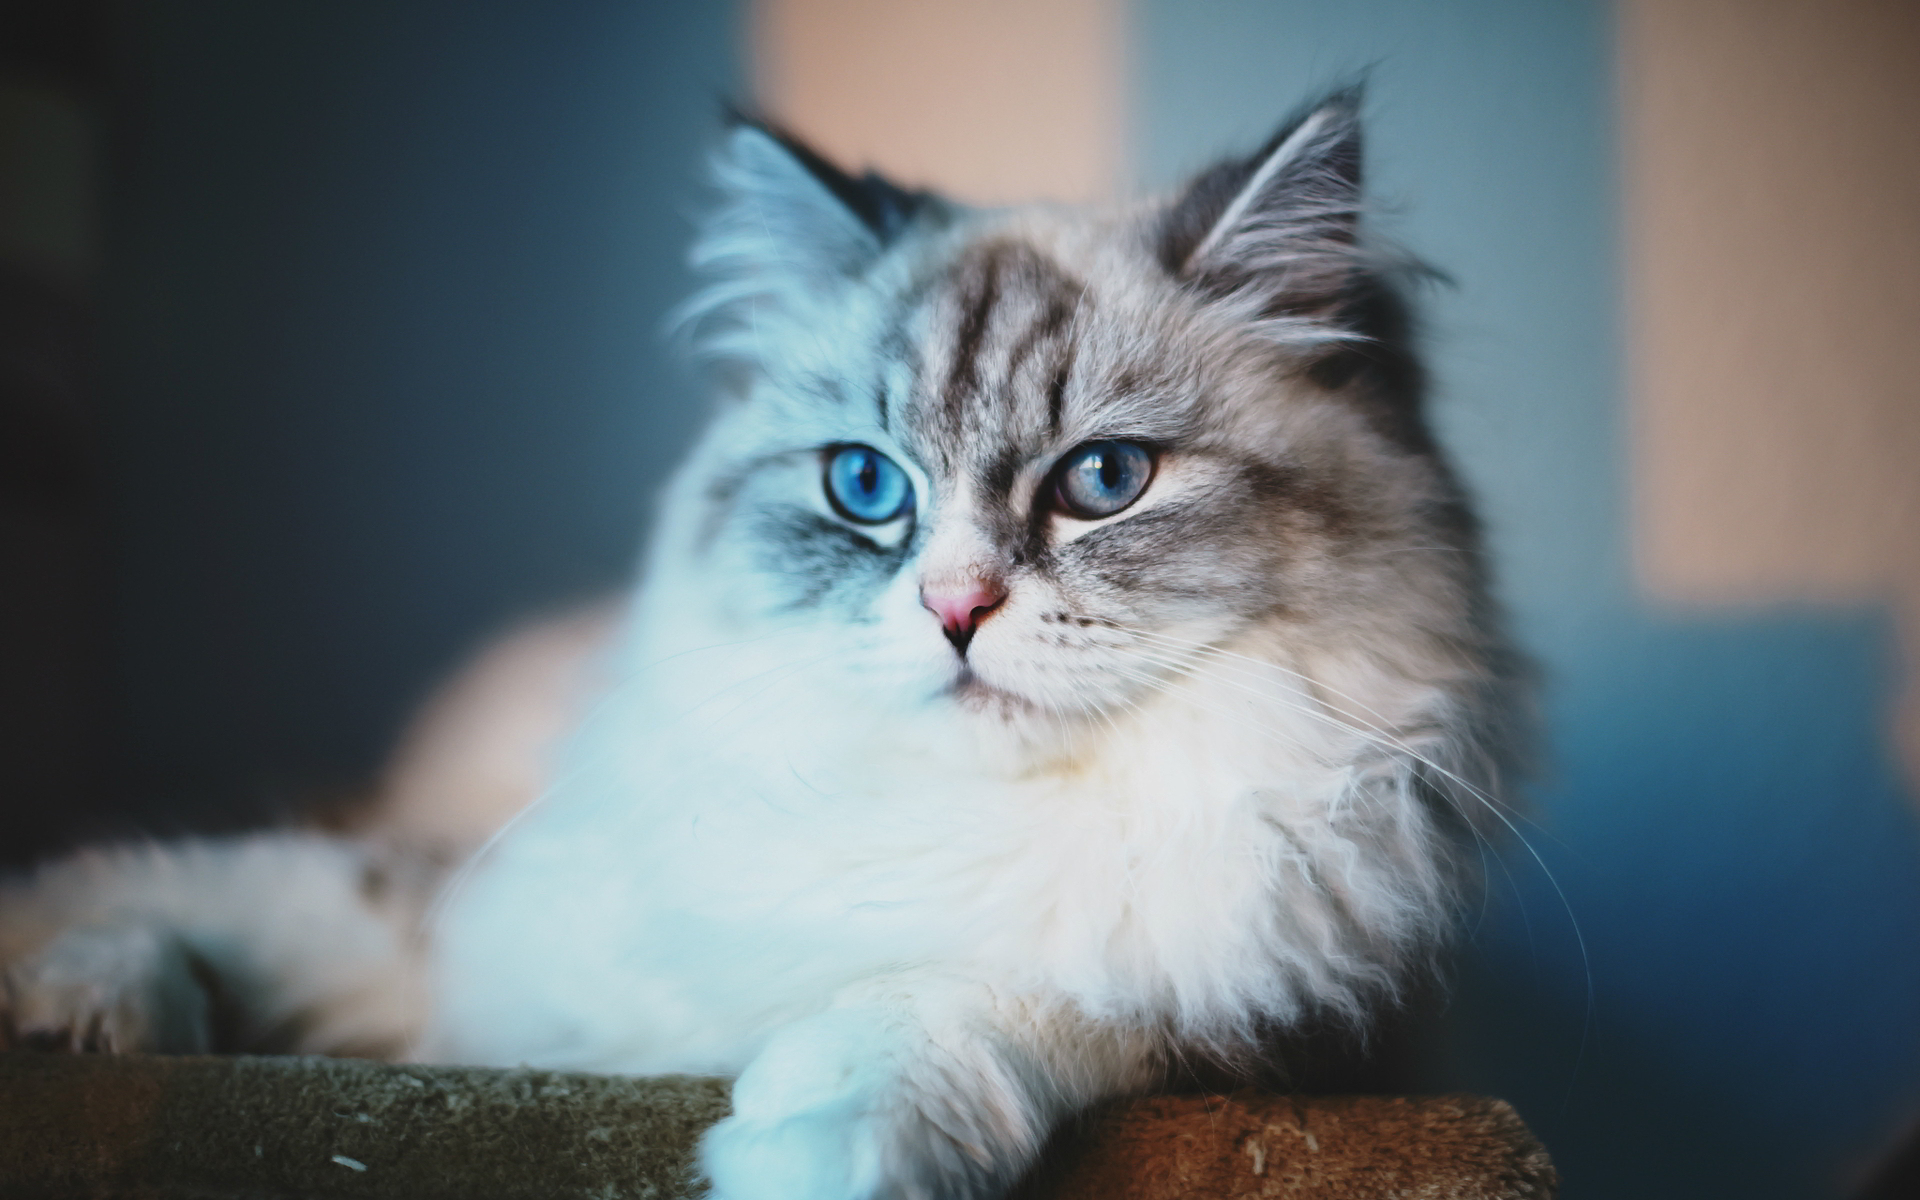 Cute Fat Cat Wallpaper Fluffy Cat Dreaming Hd Desktop Wallpapers 4k Hd